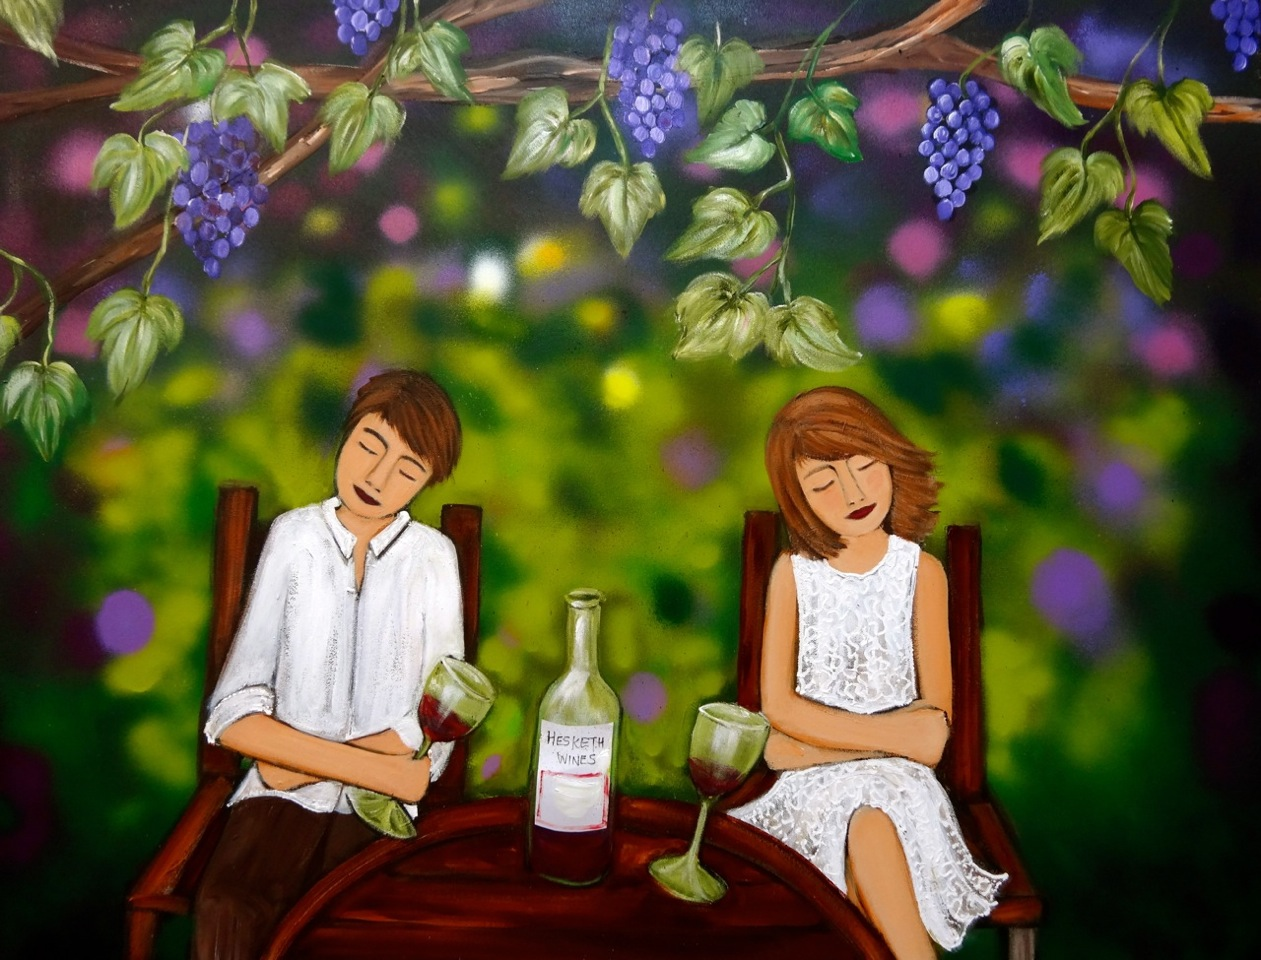 Hesketh Wine label Feb 2015.jpeg